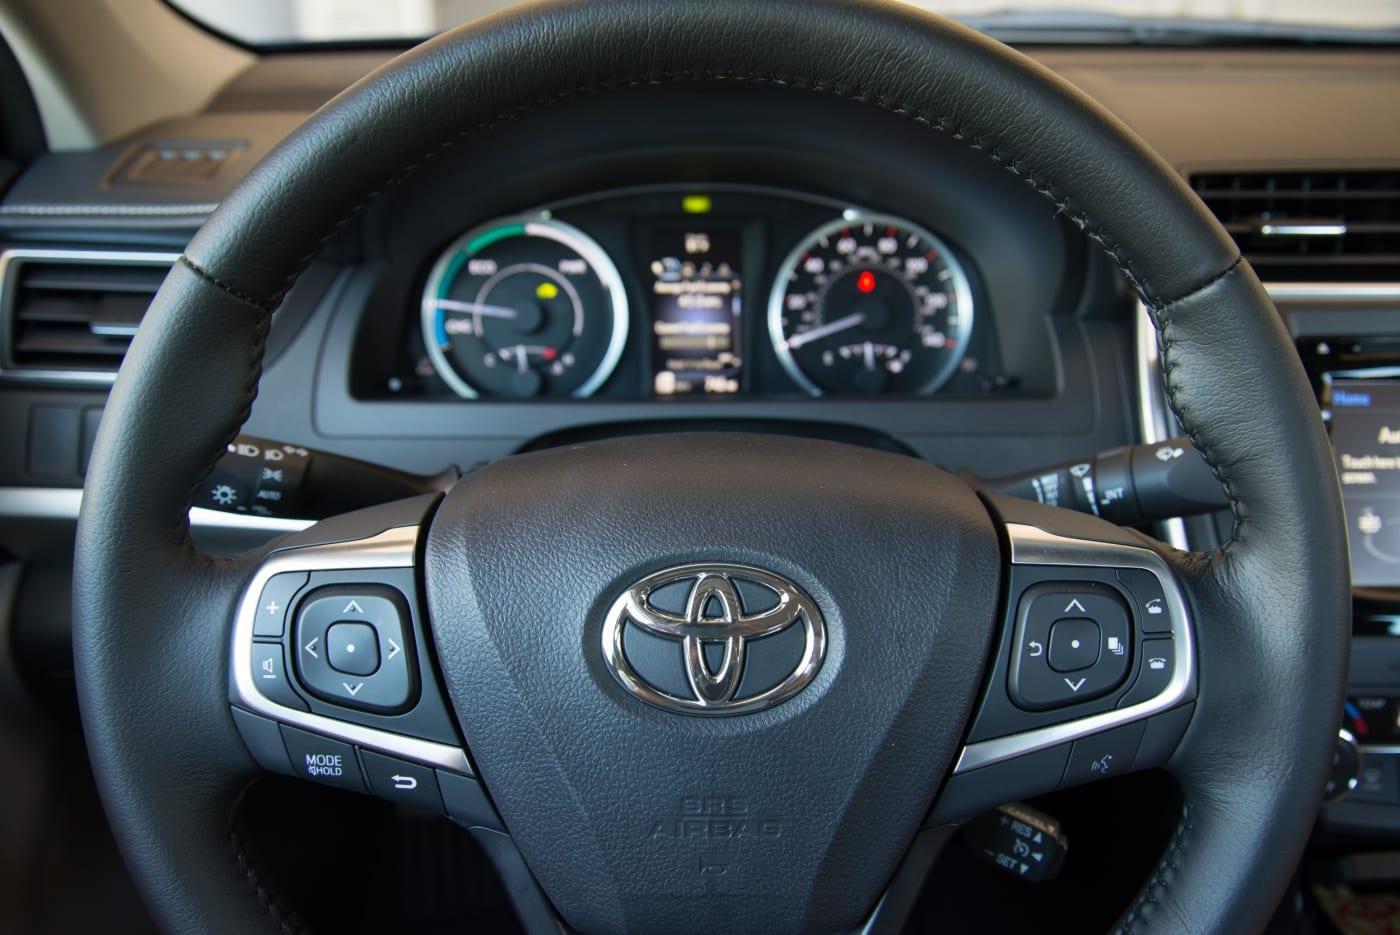 Toyota strengthens autonomous car program with new hires